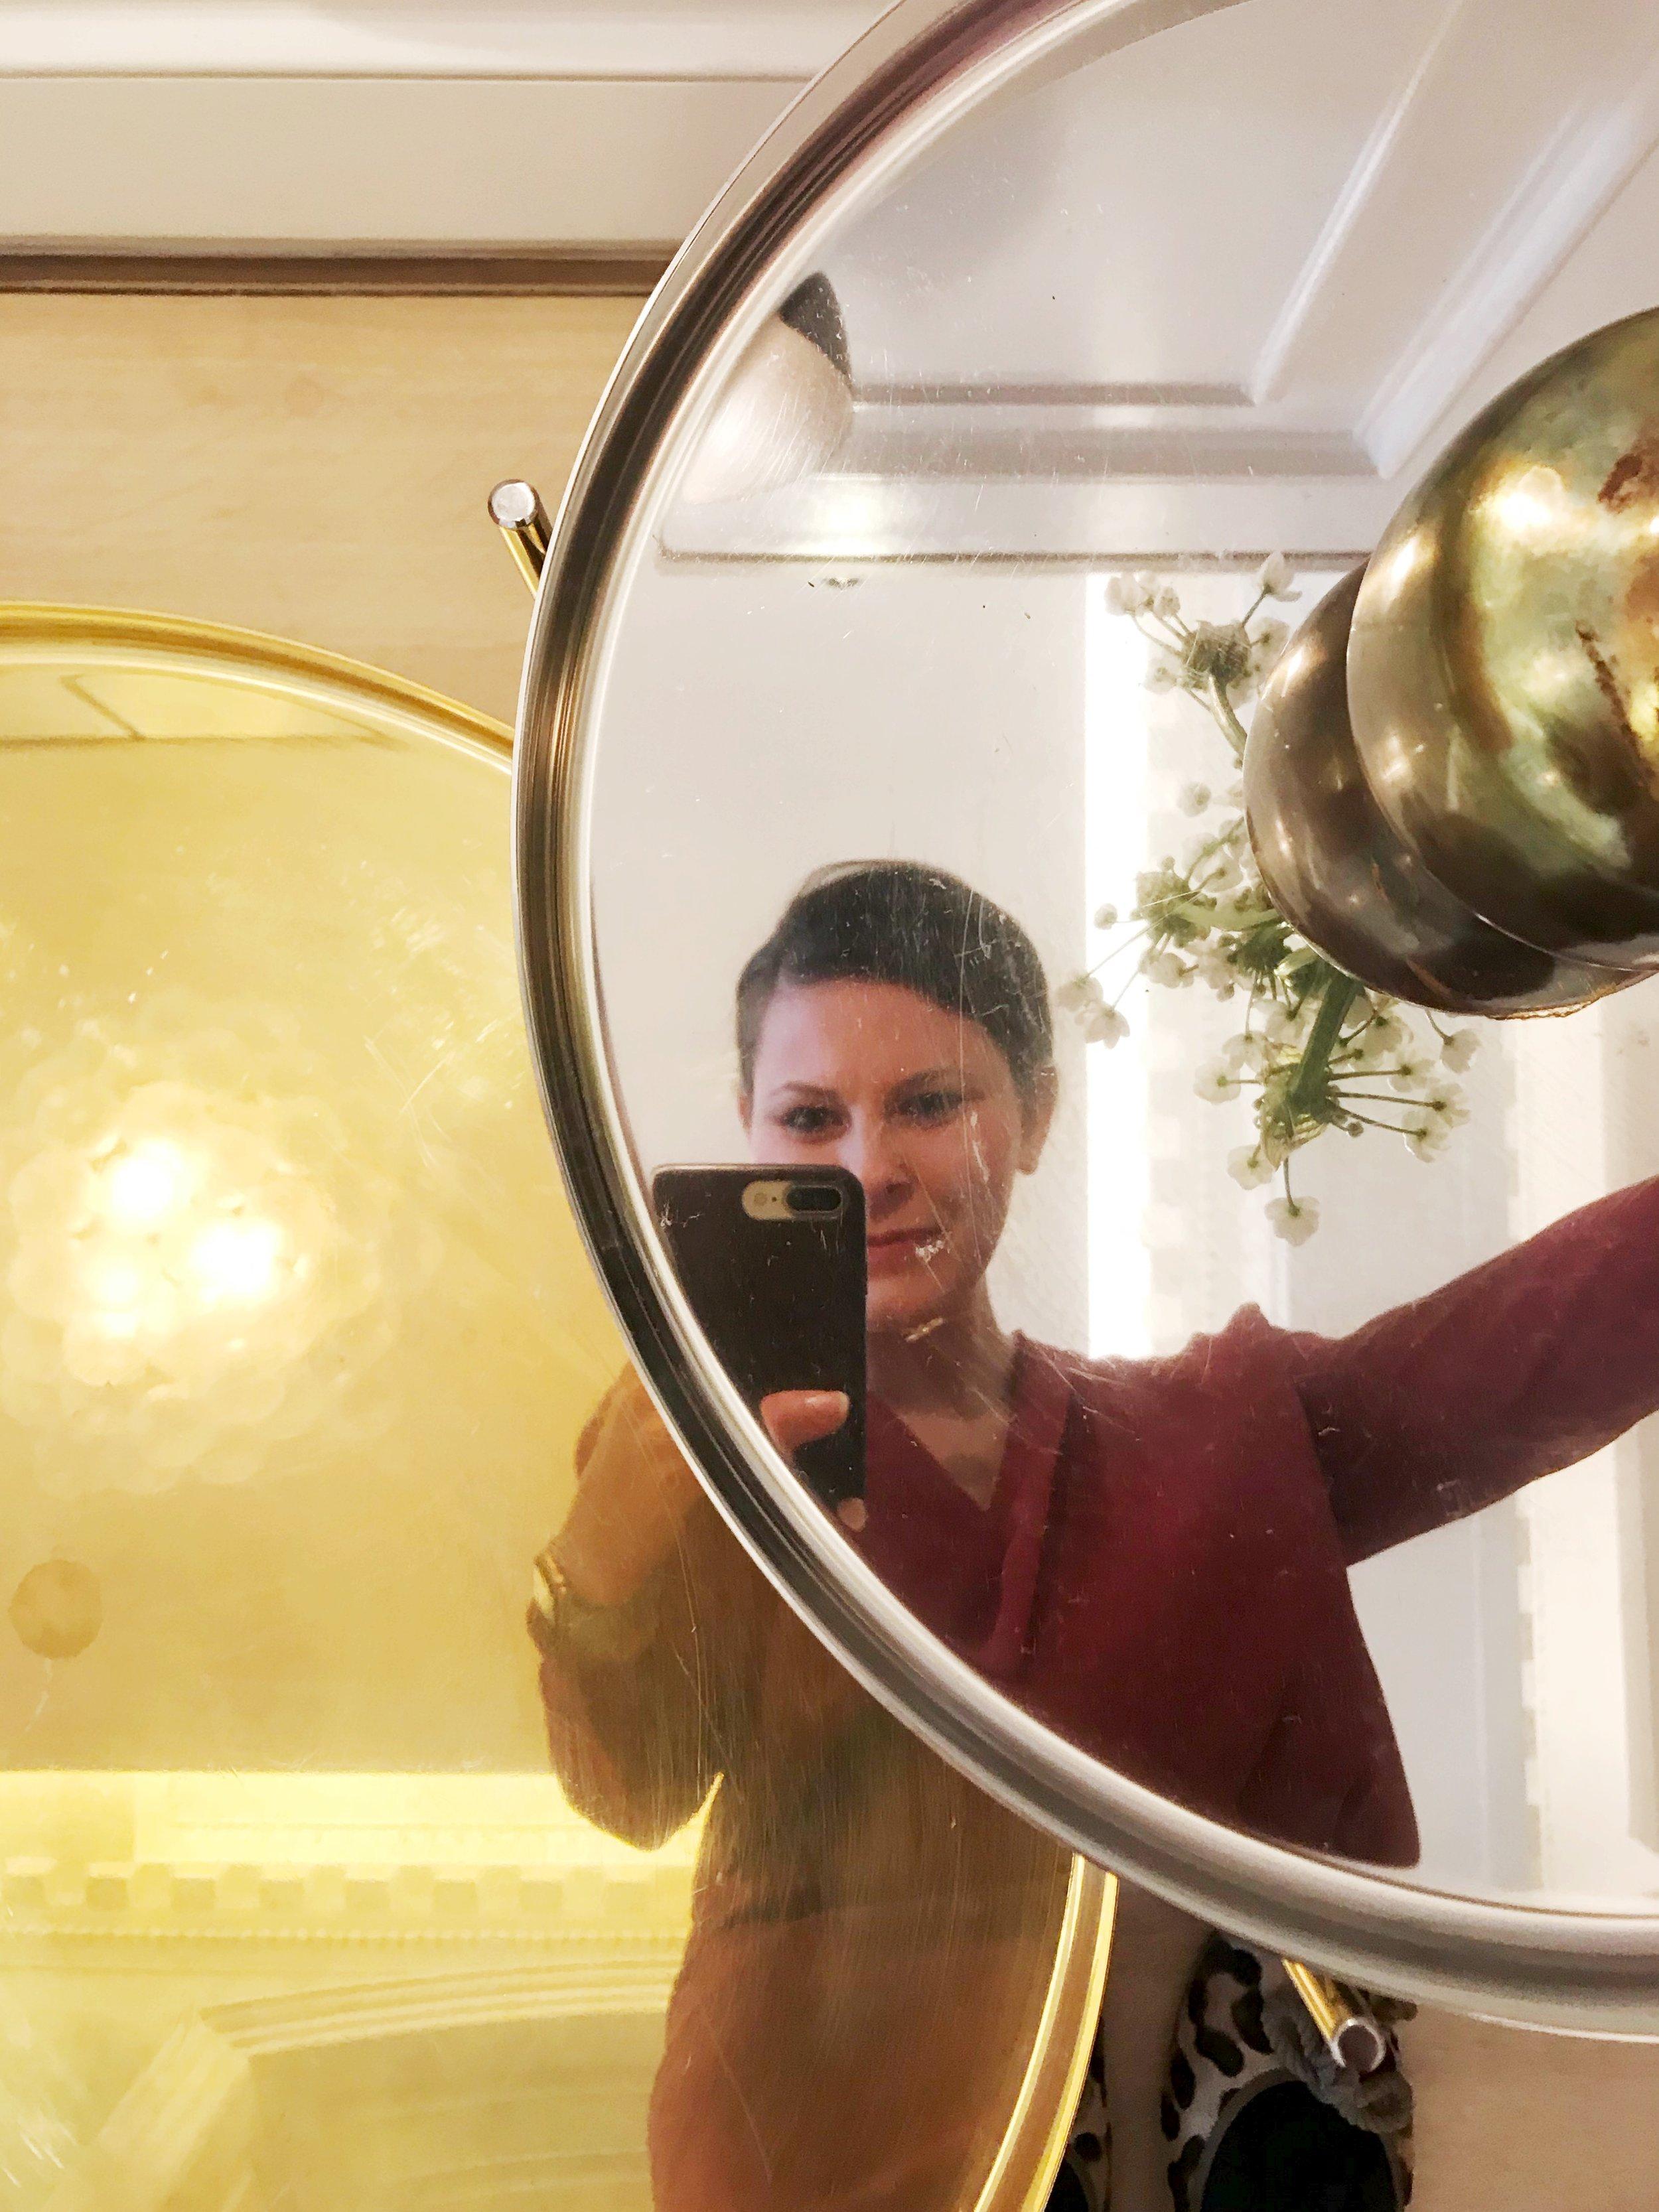 spring-somerset-house-mirror.JPG